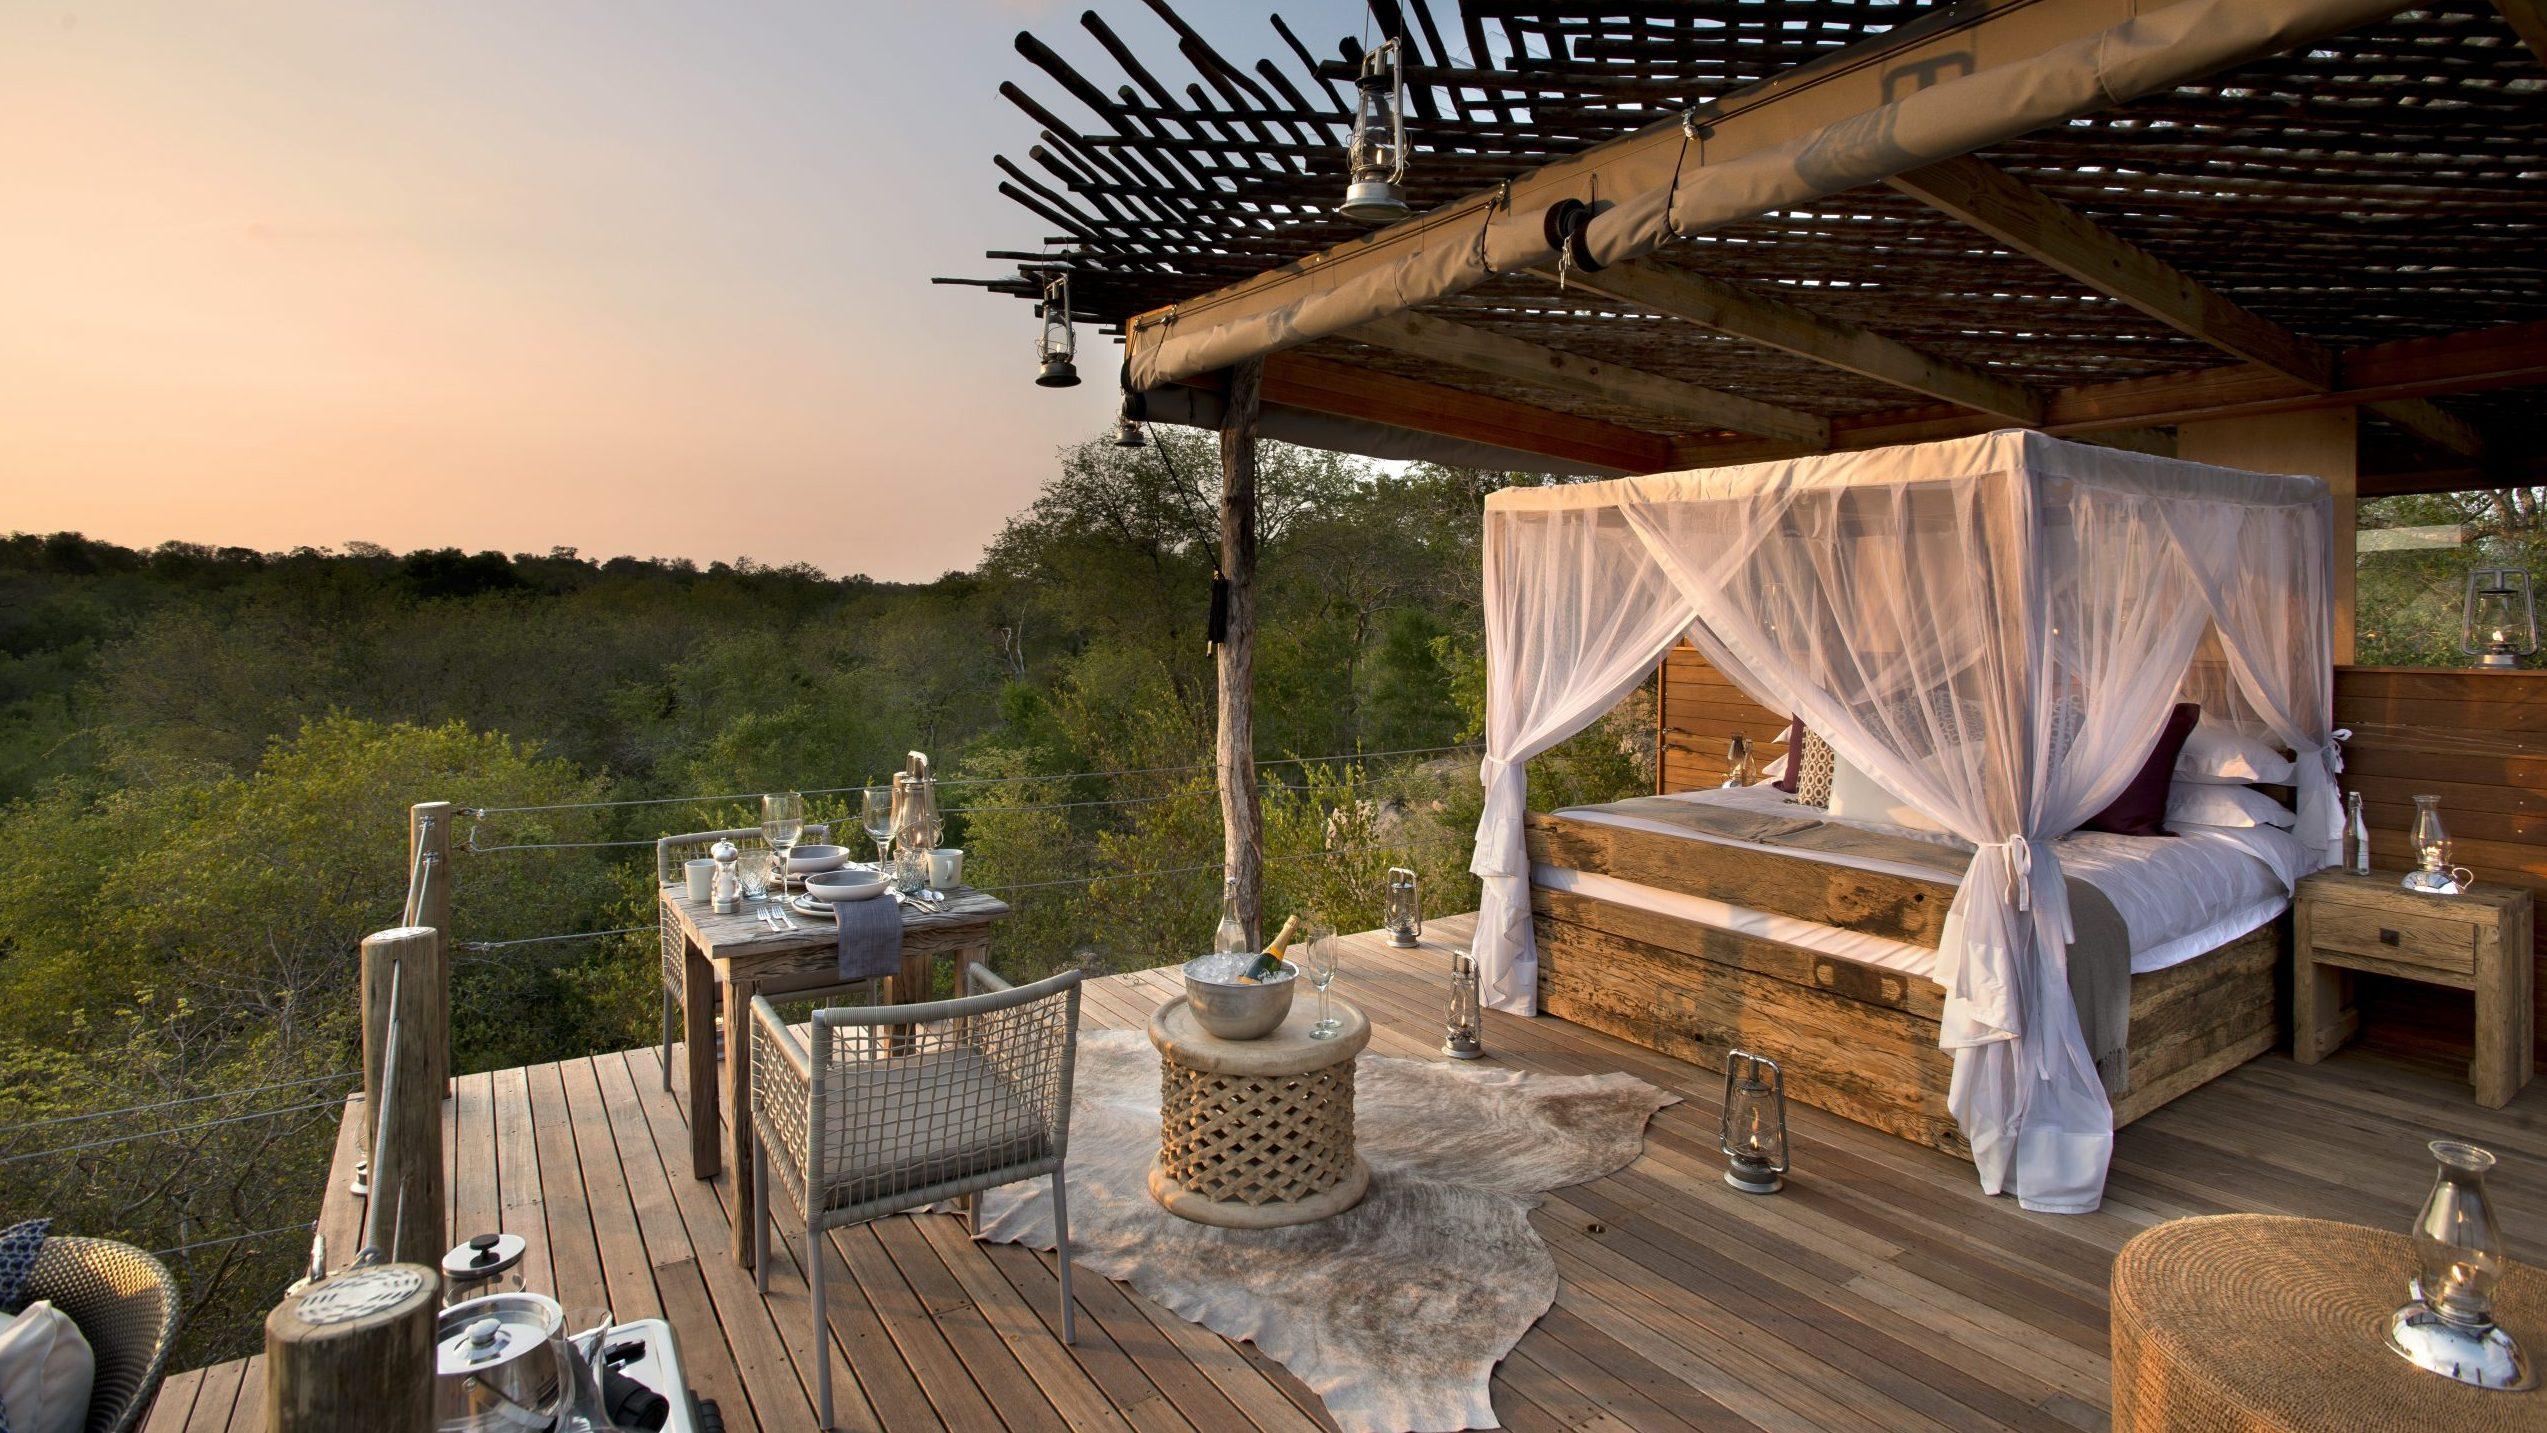 Treehouse Safari South Africa